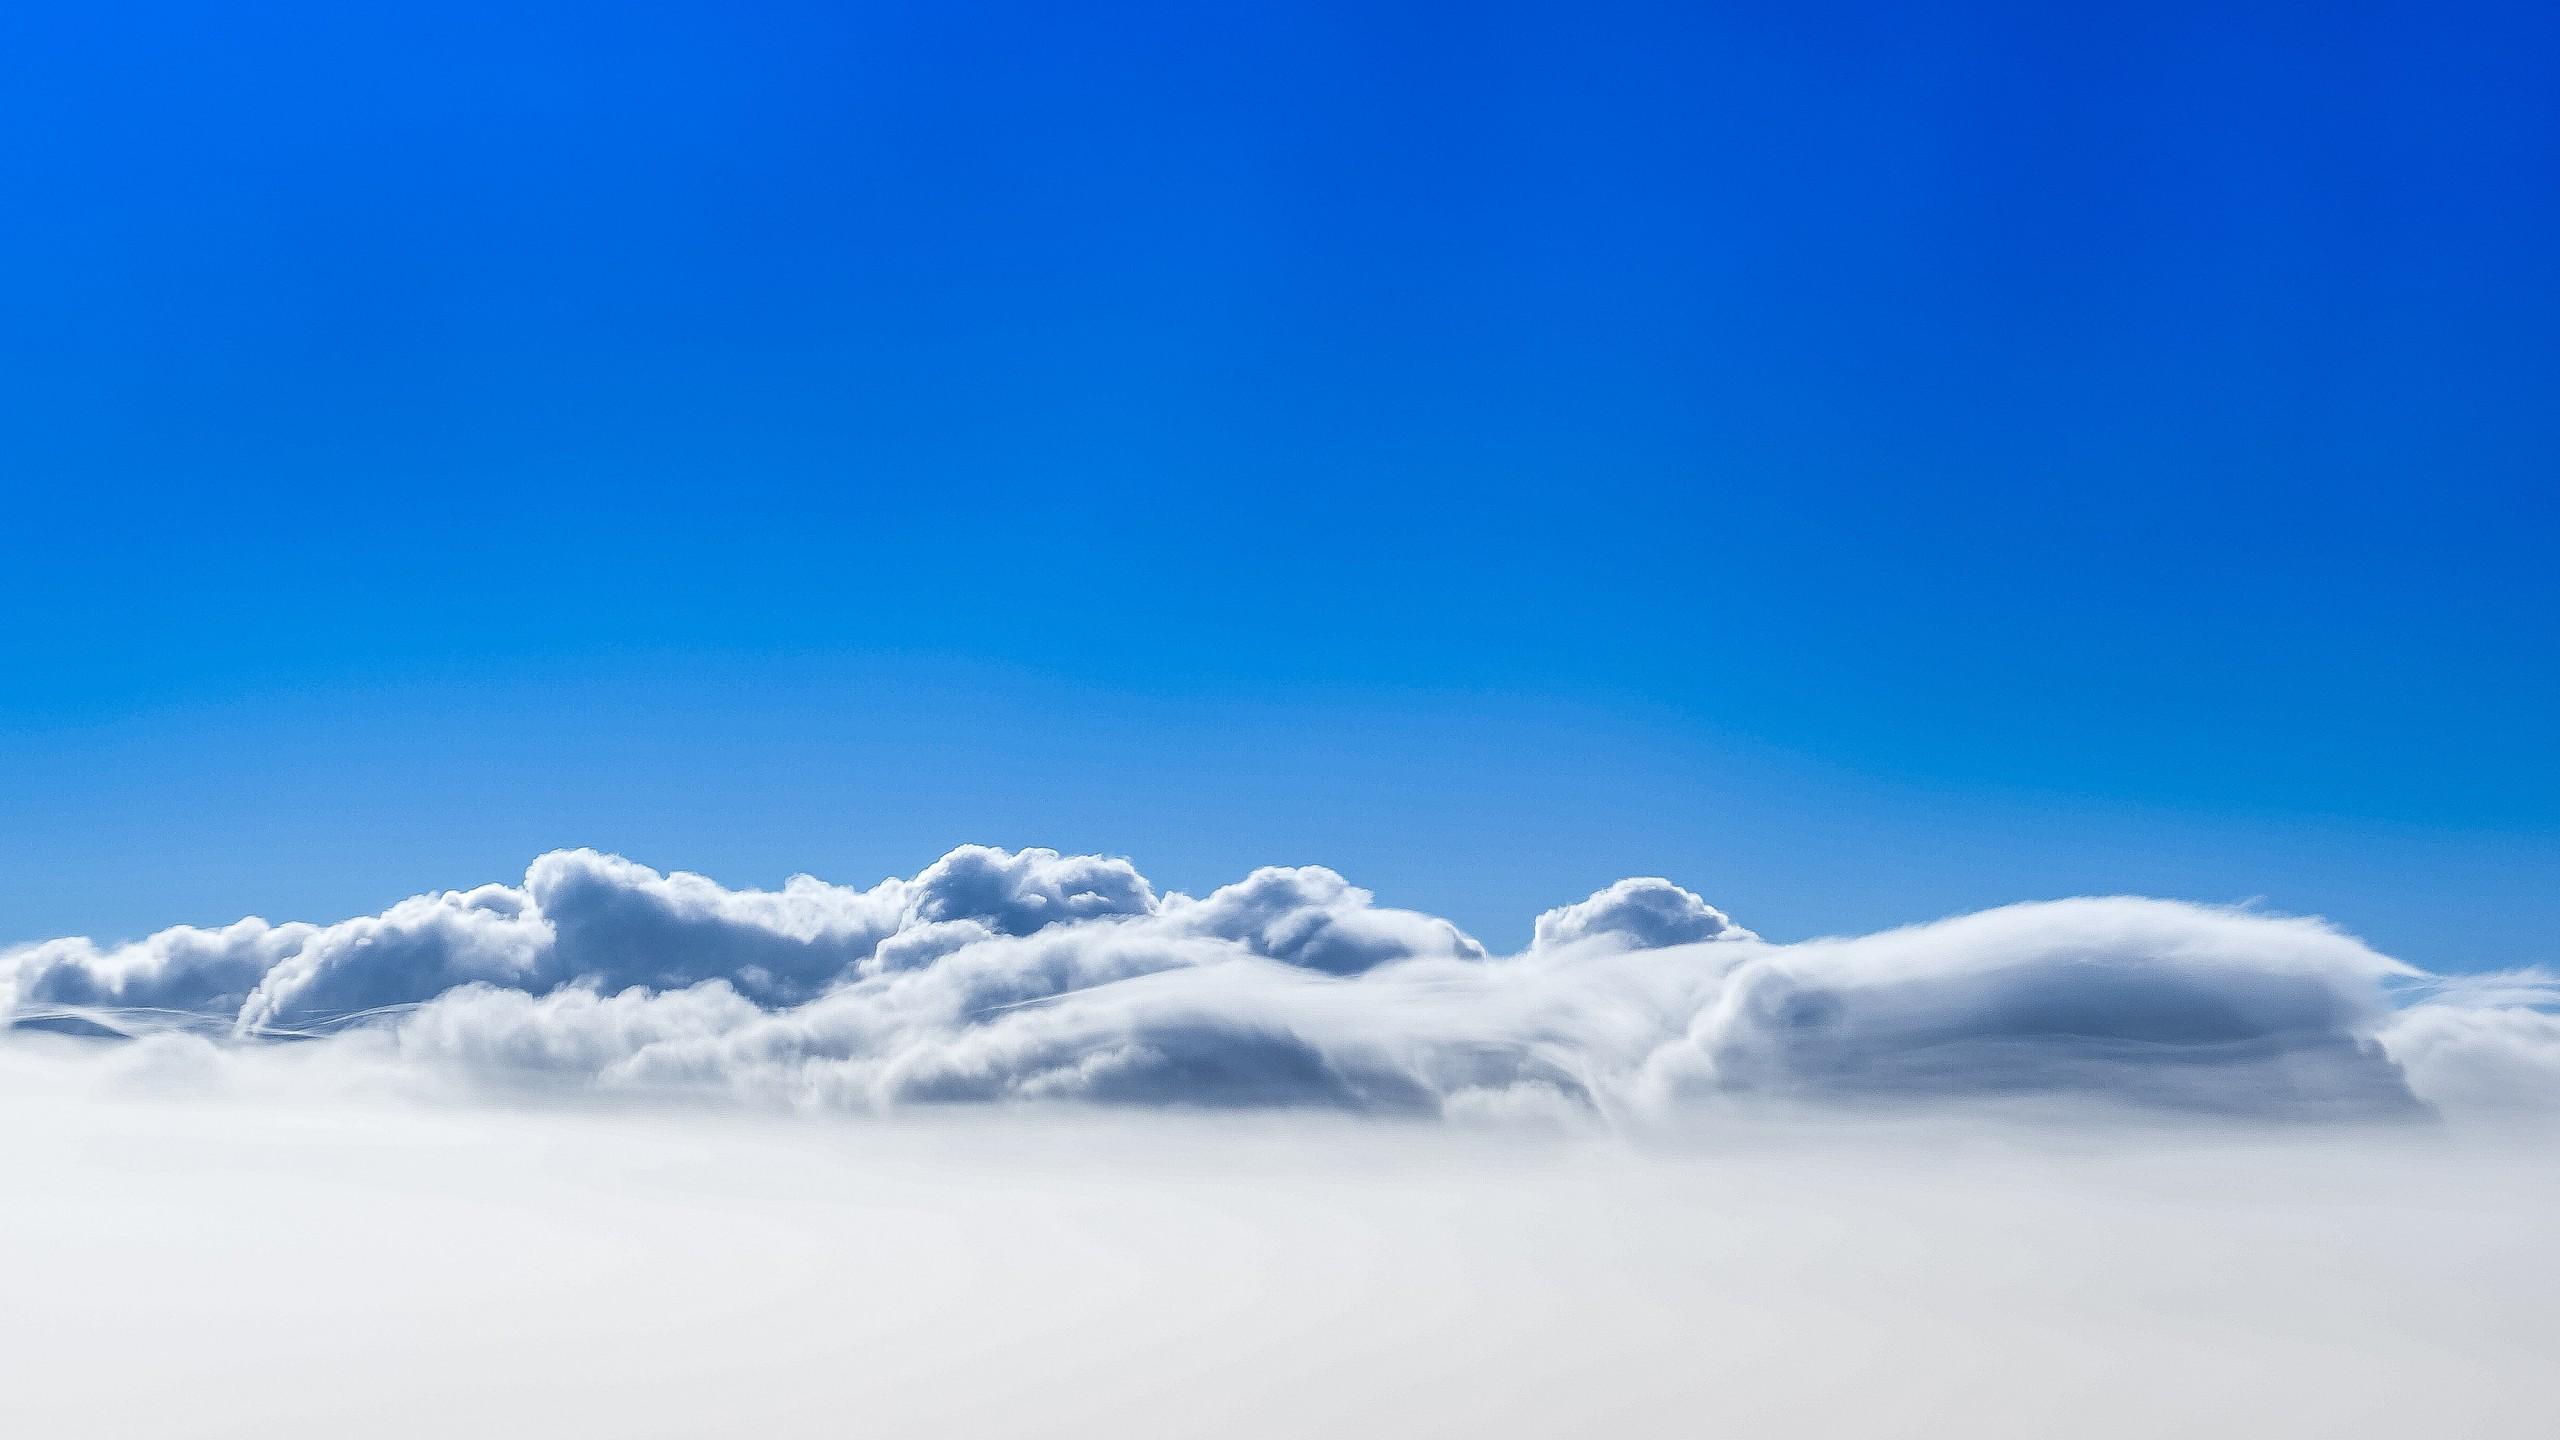 Nature / Clouds Wallpaper